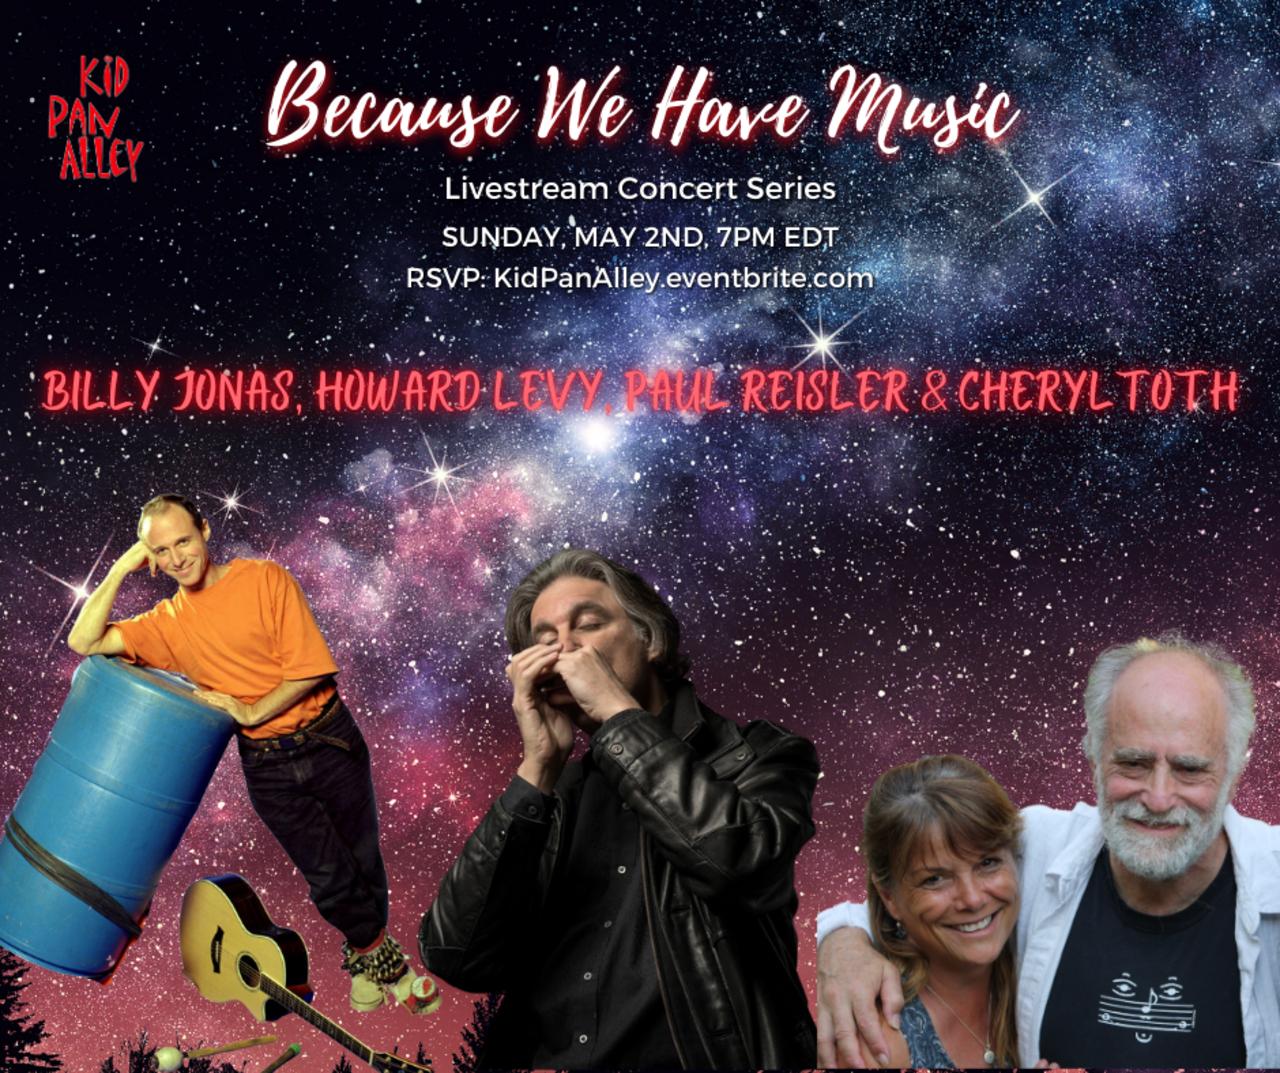 Family Concert  A fun FAMILY Concert w Billy Jonas Howard Levy Paul Reisler amp Cheryl Toth